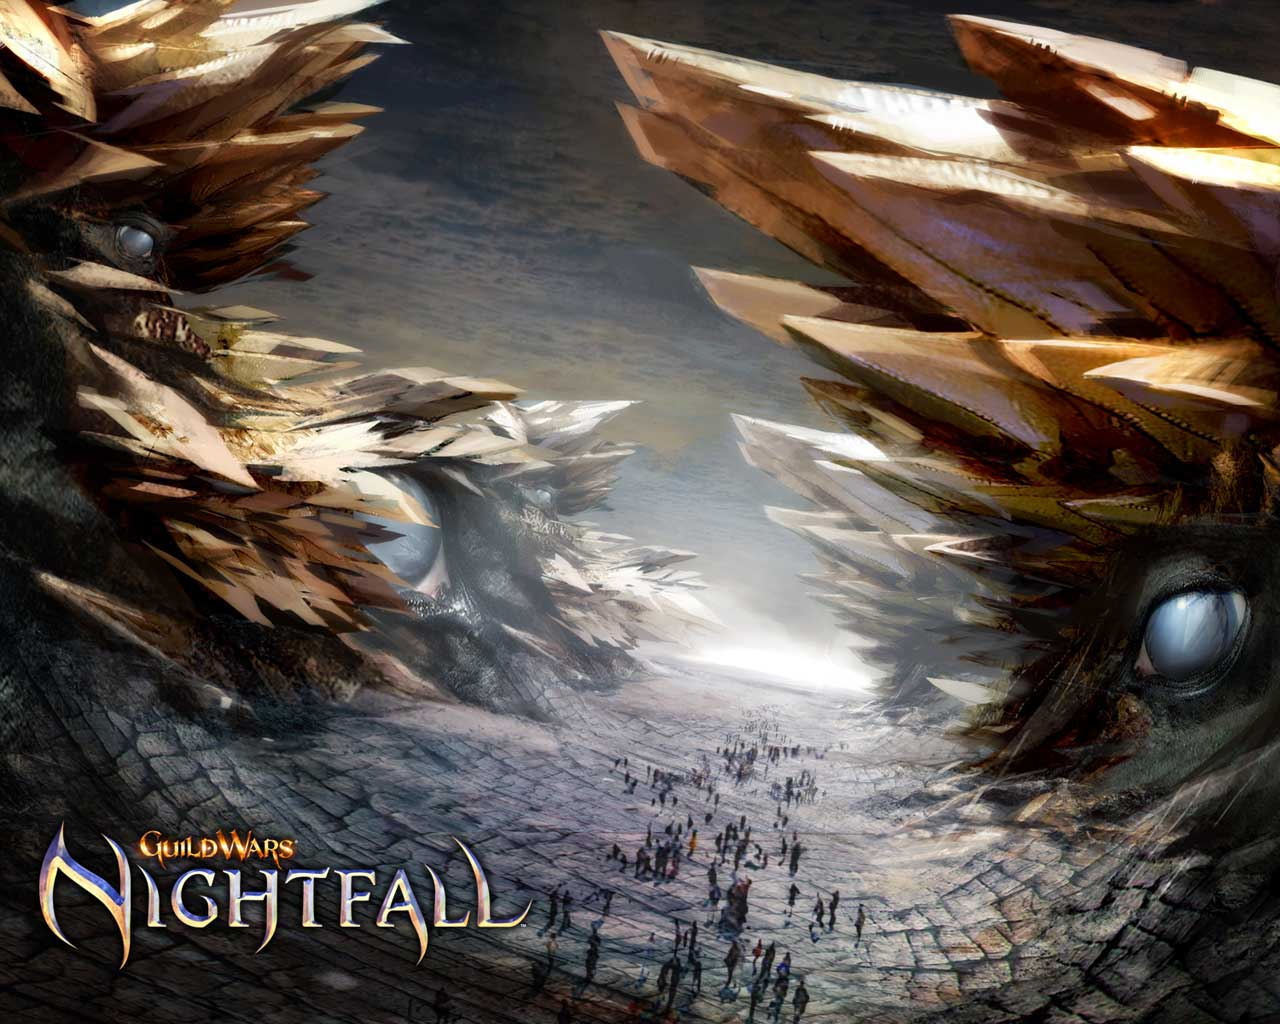 Guild Wars Nightfall 2